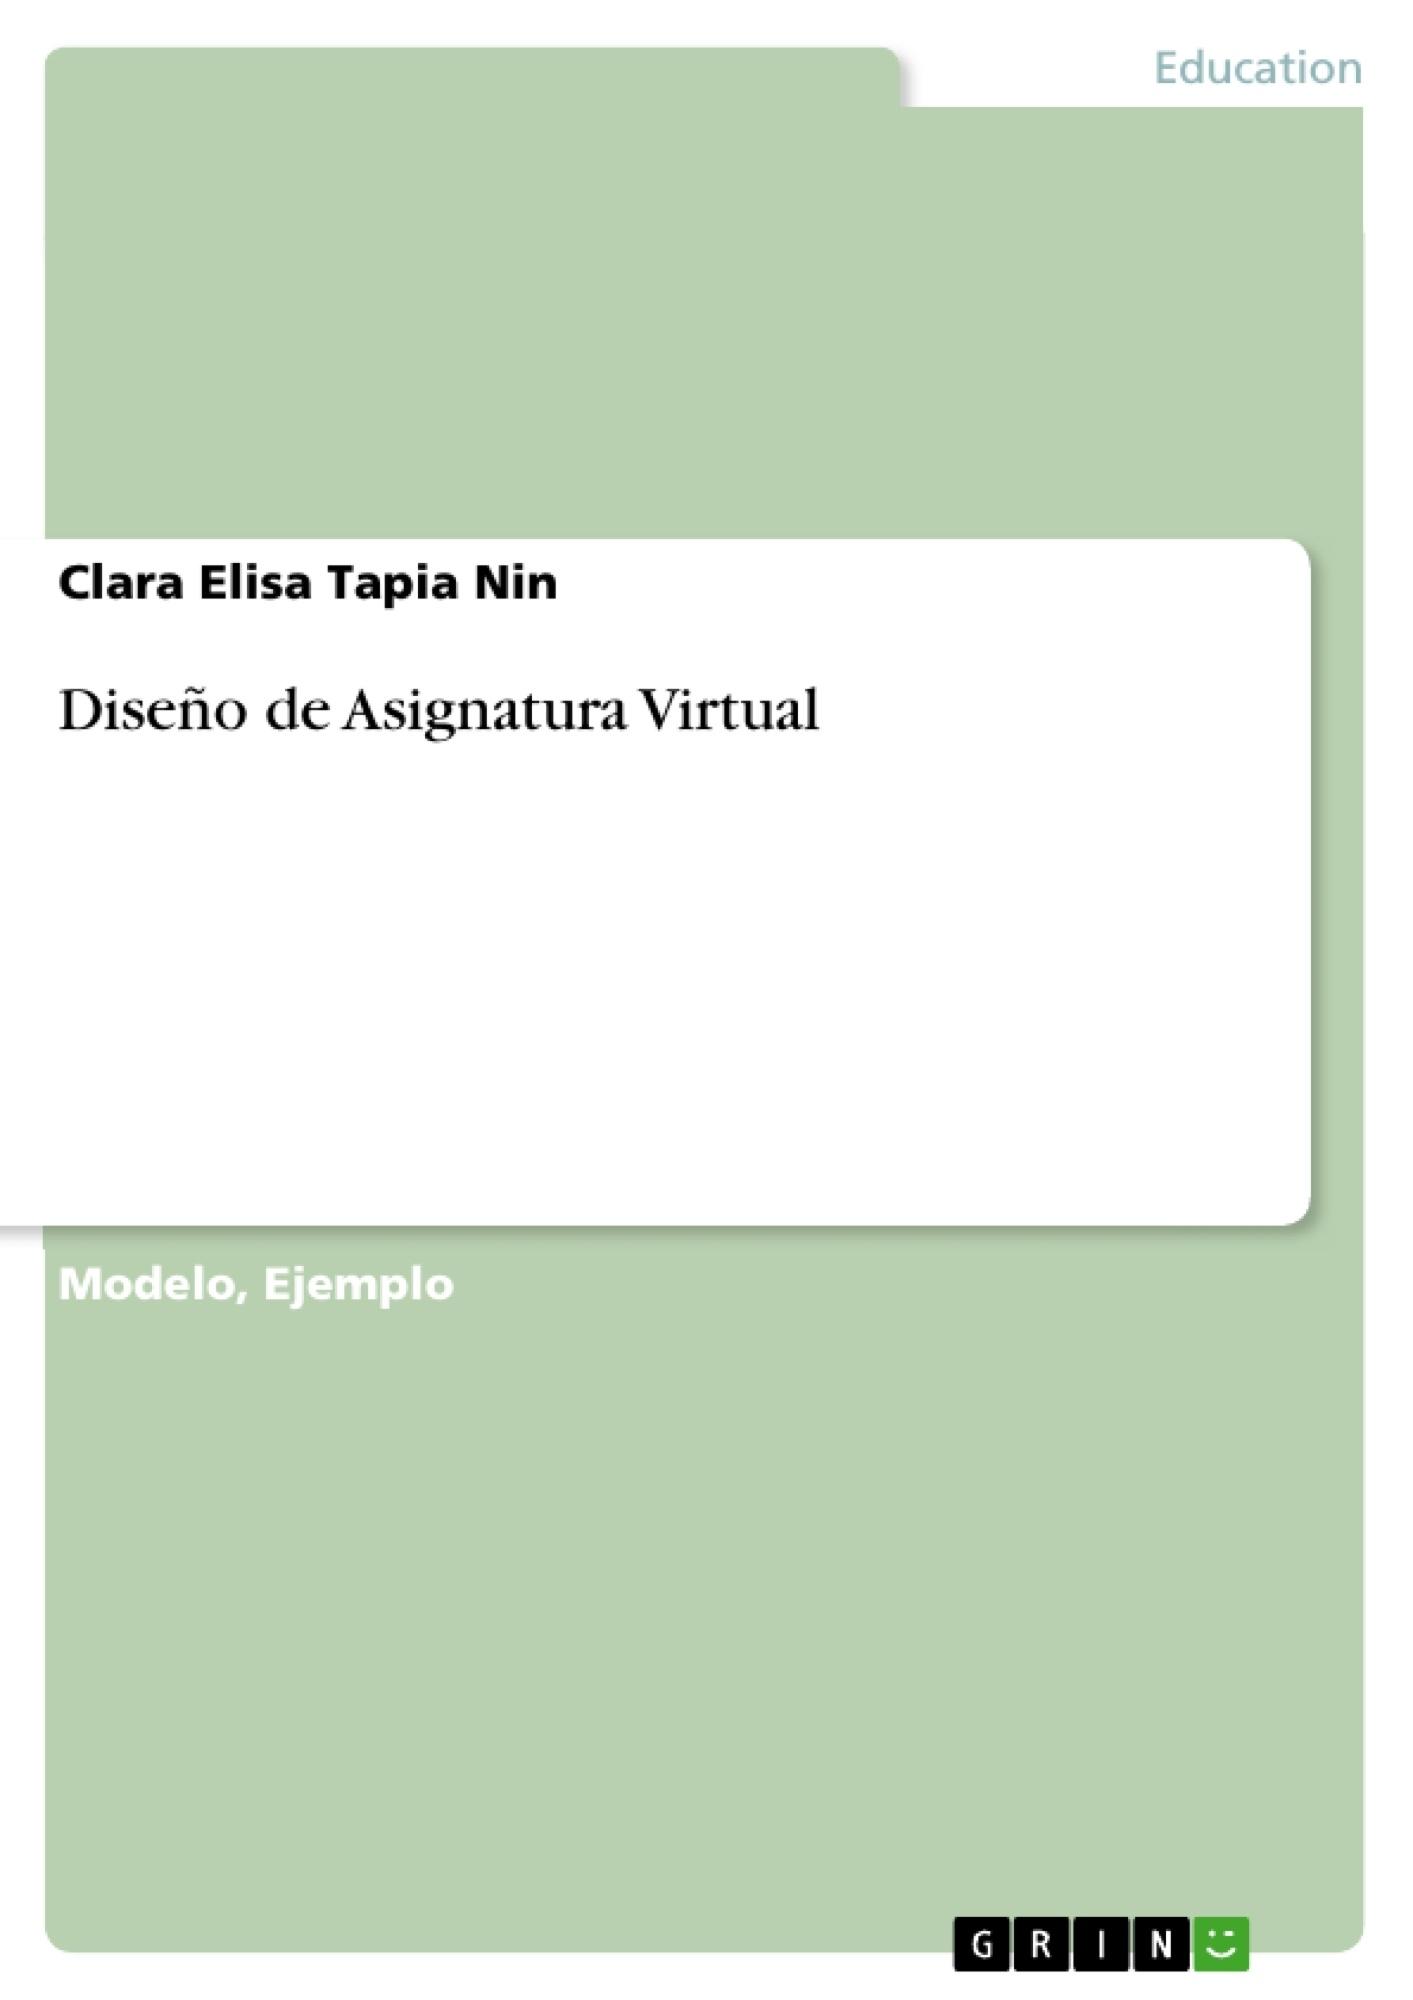 Título: Diseño de Asignatura Virtual